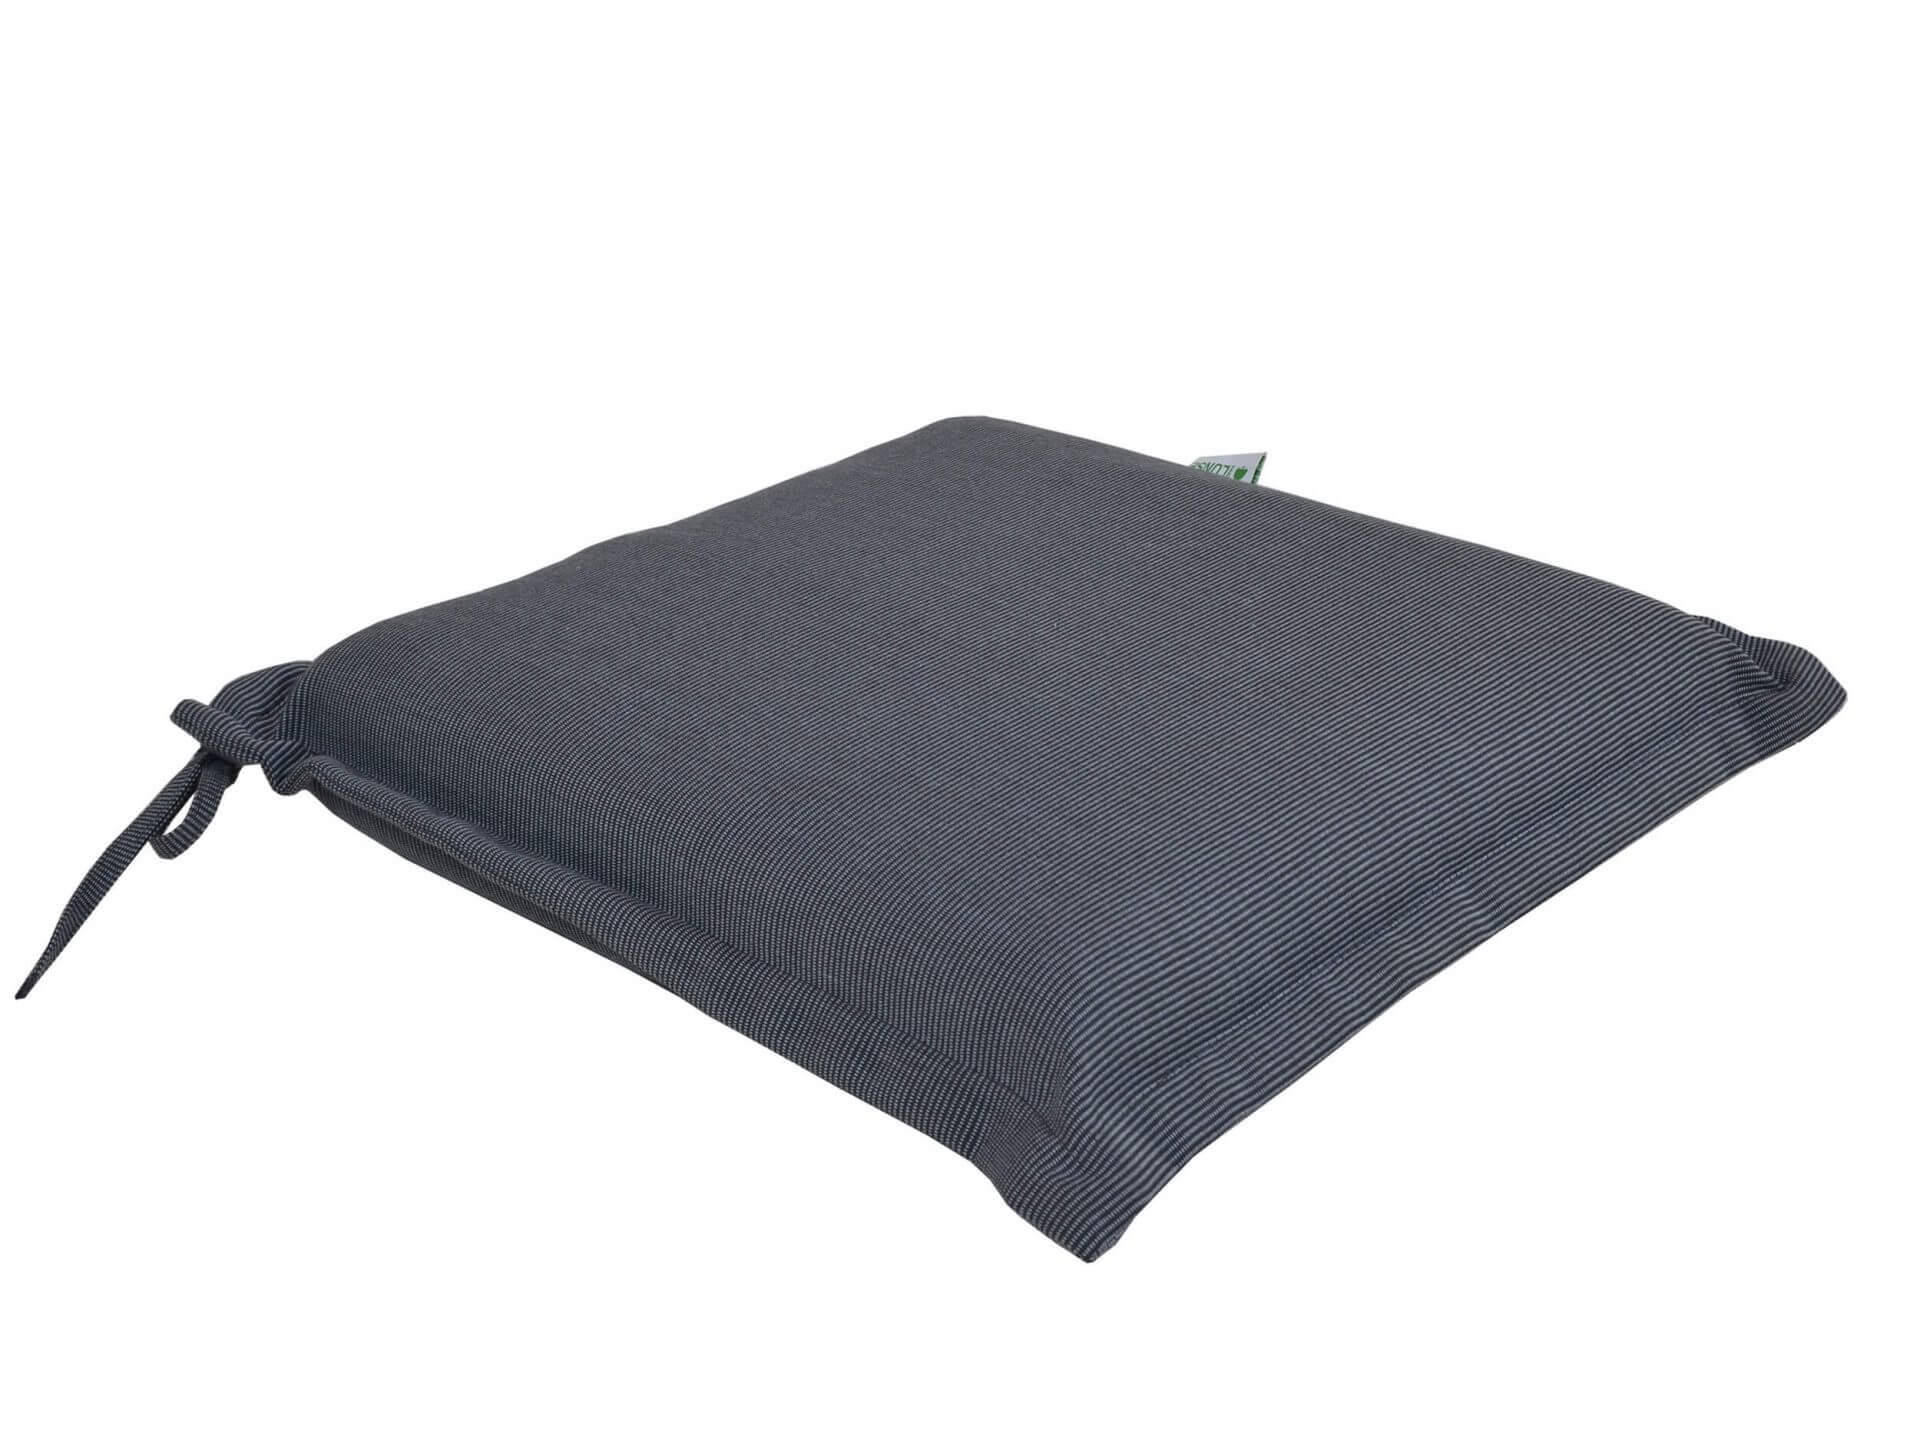 Sitzkissen Malibu 50x50cm grey